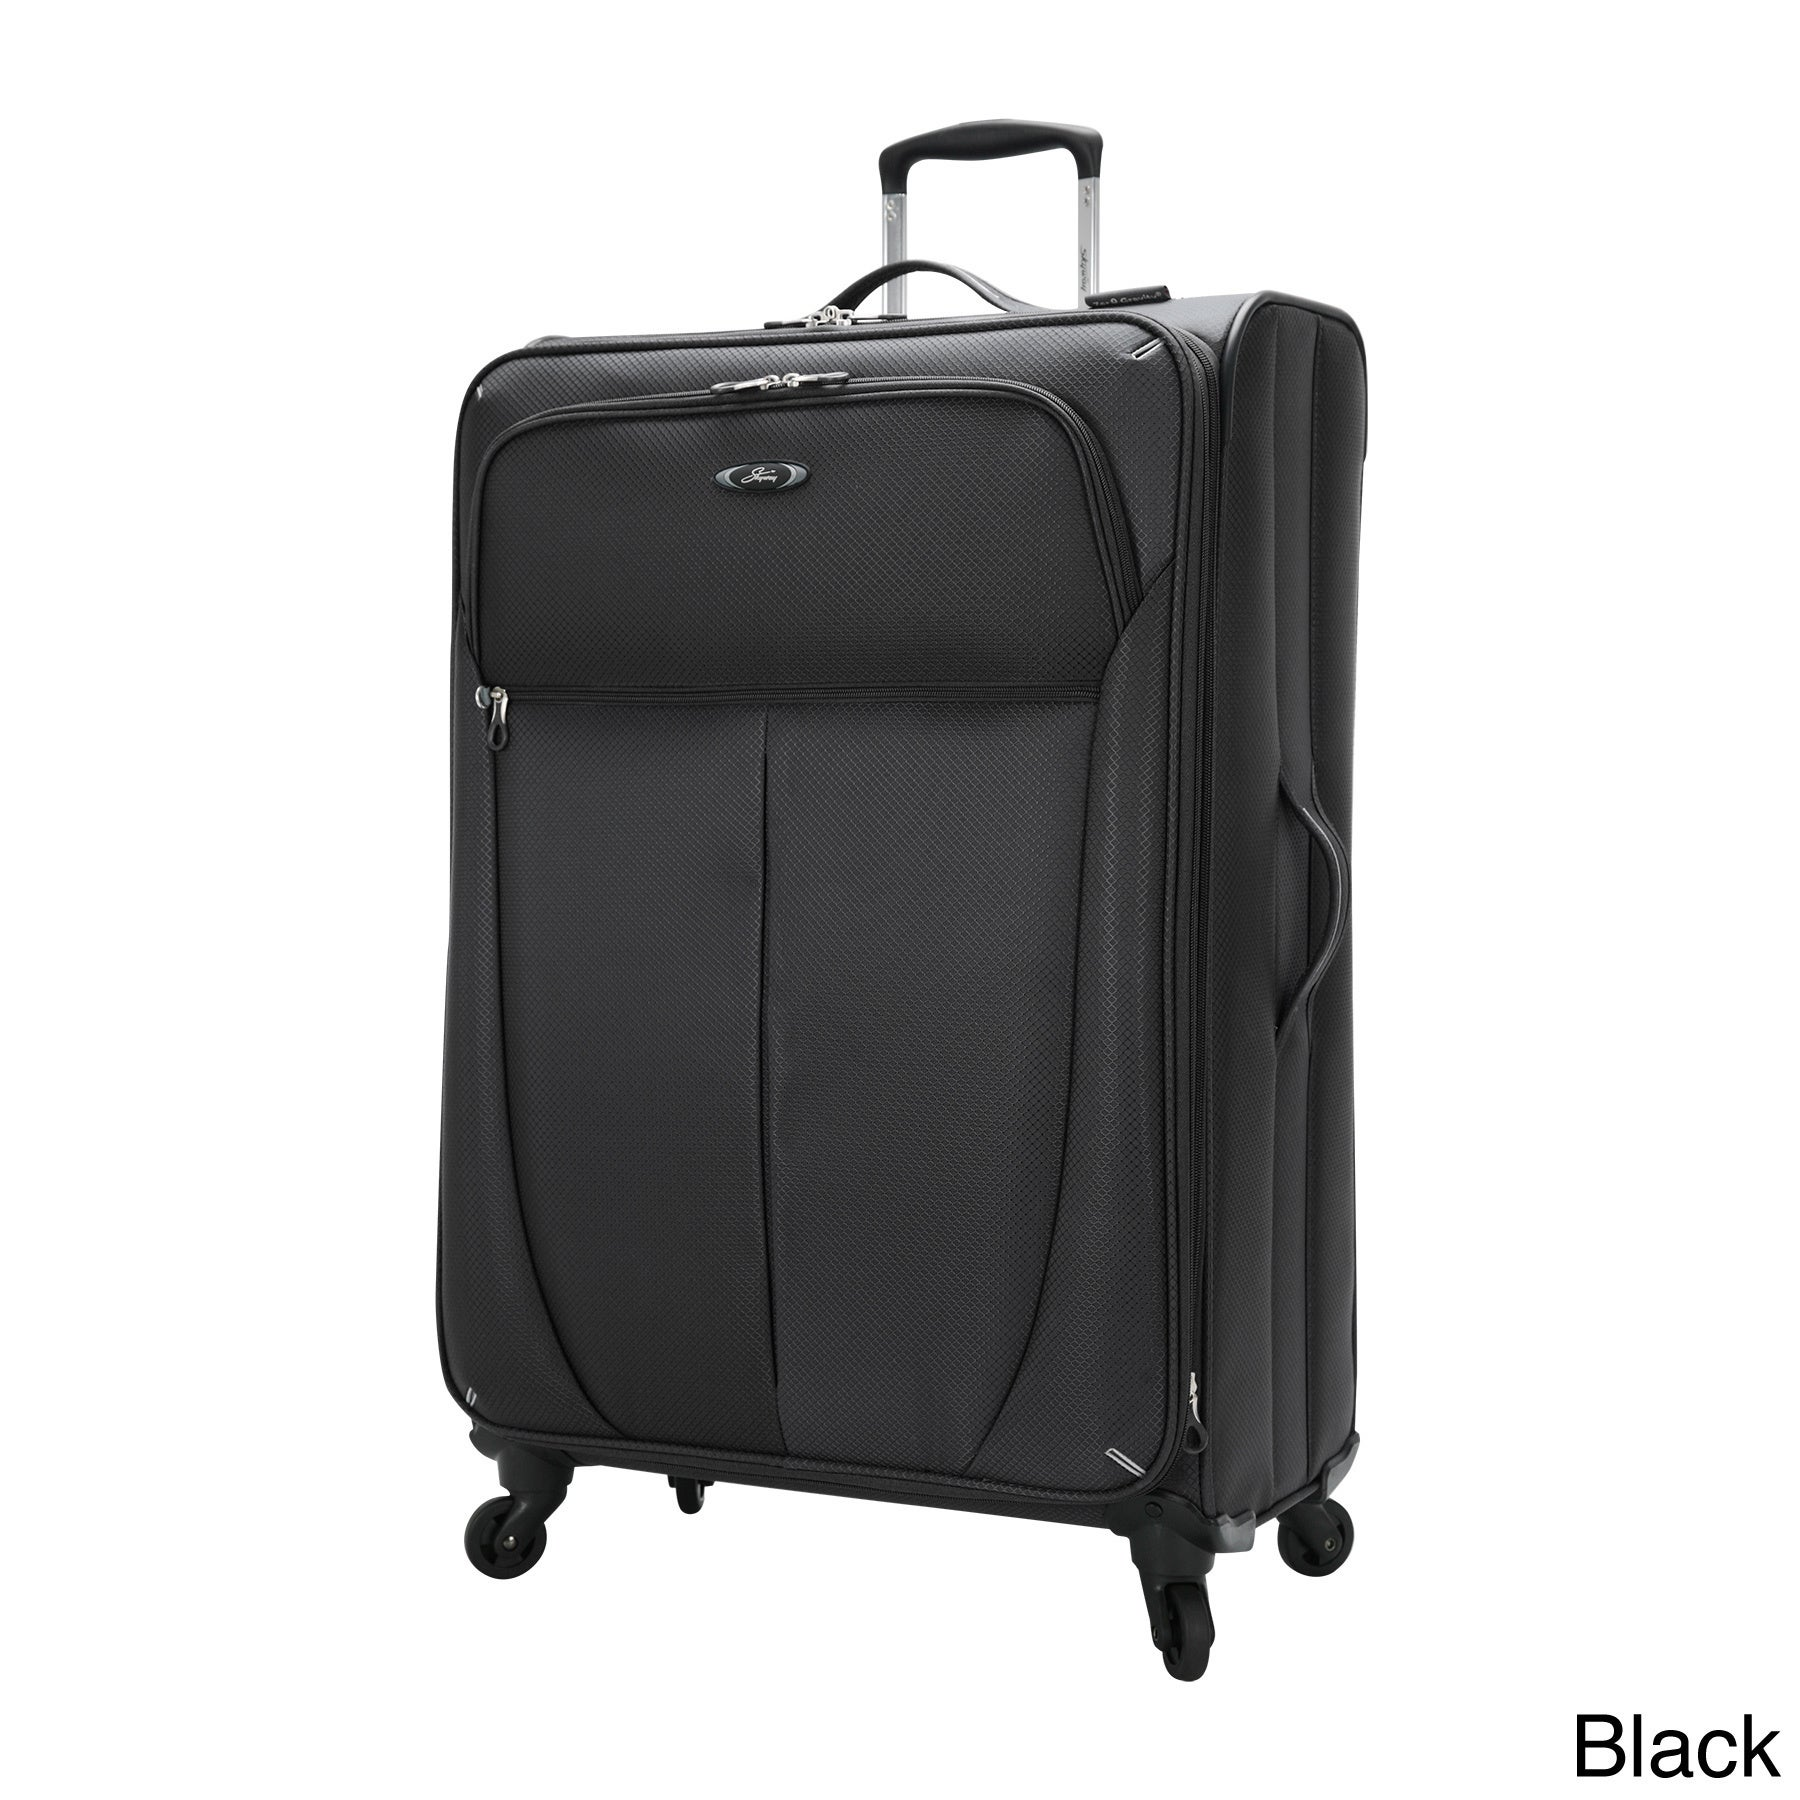 Skyway Luggage Skyway 'Mirage' Superlight 28-inch Expanda...